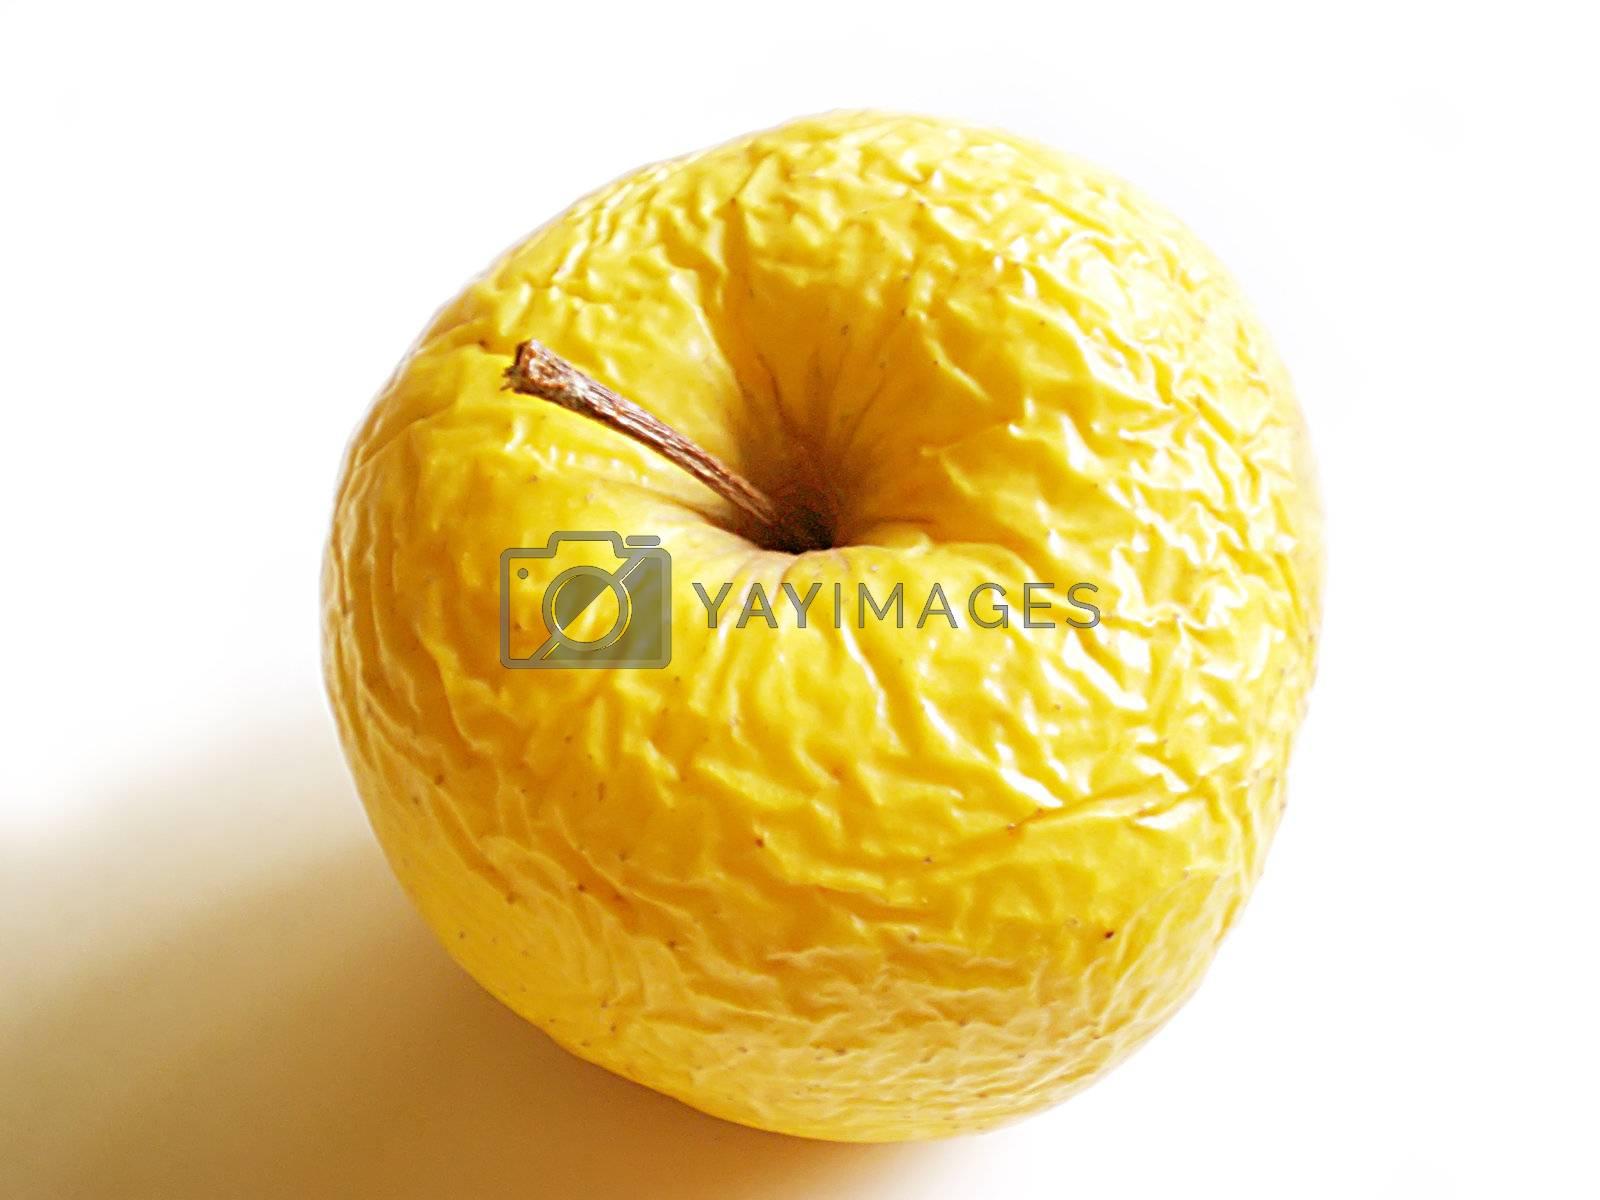 Royalty free image of apple by Dessie_bg